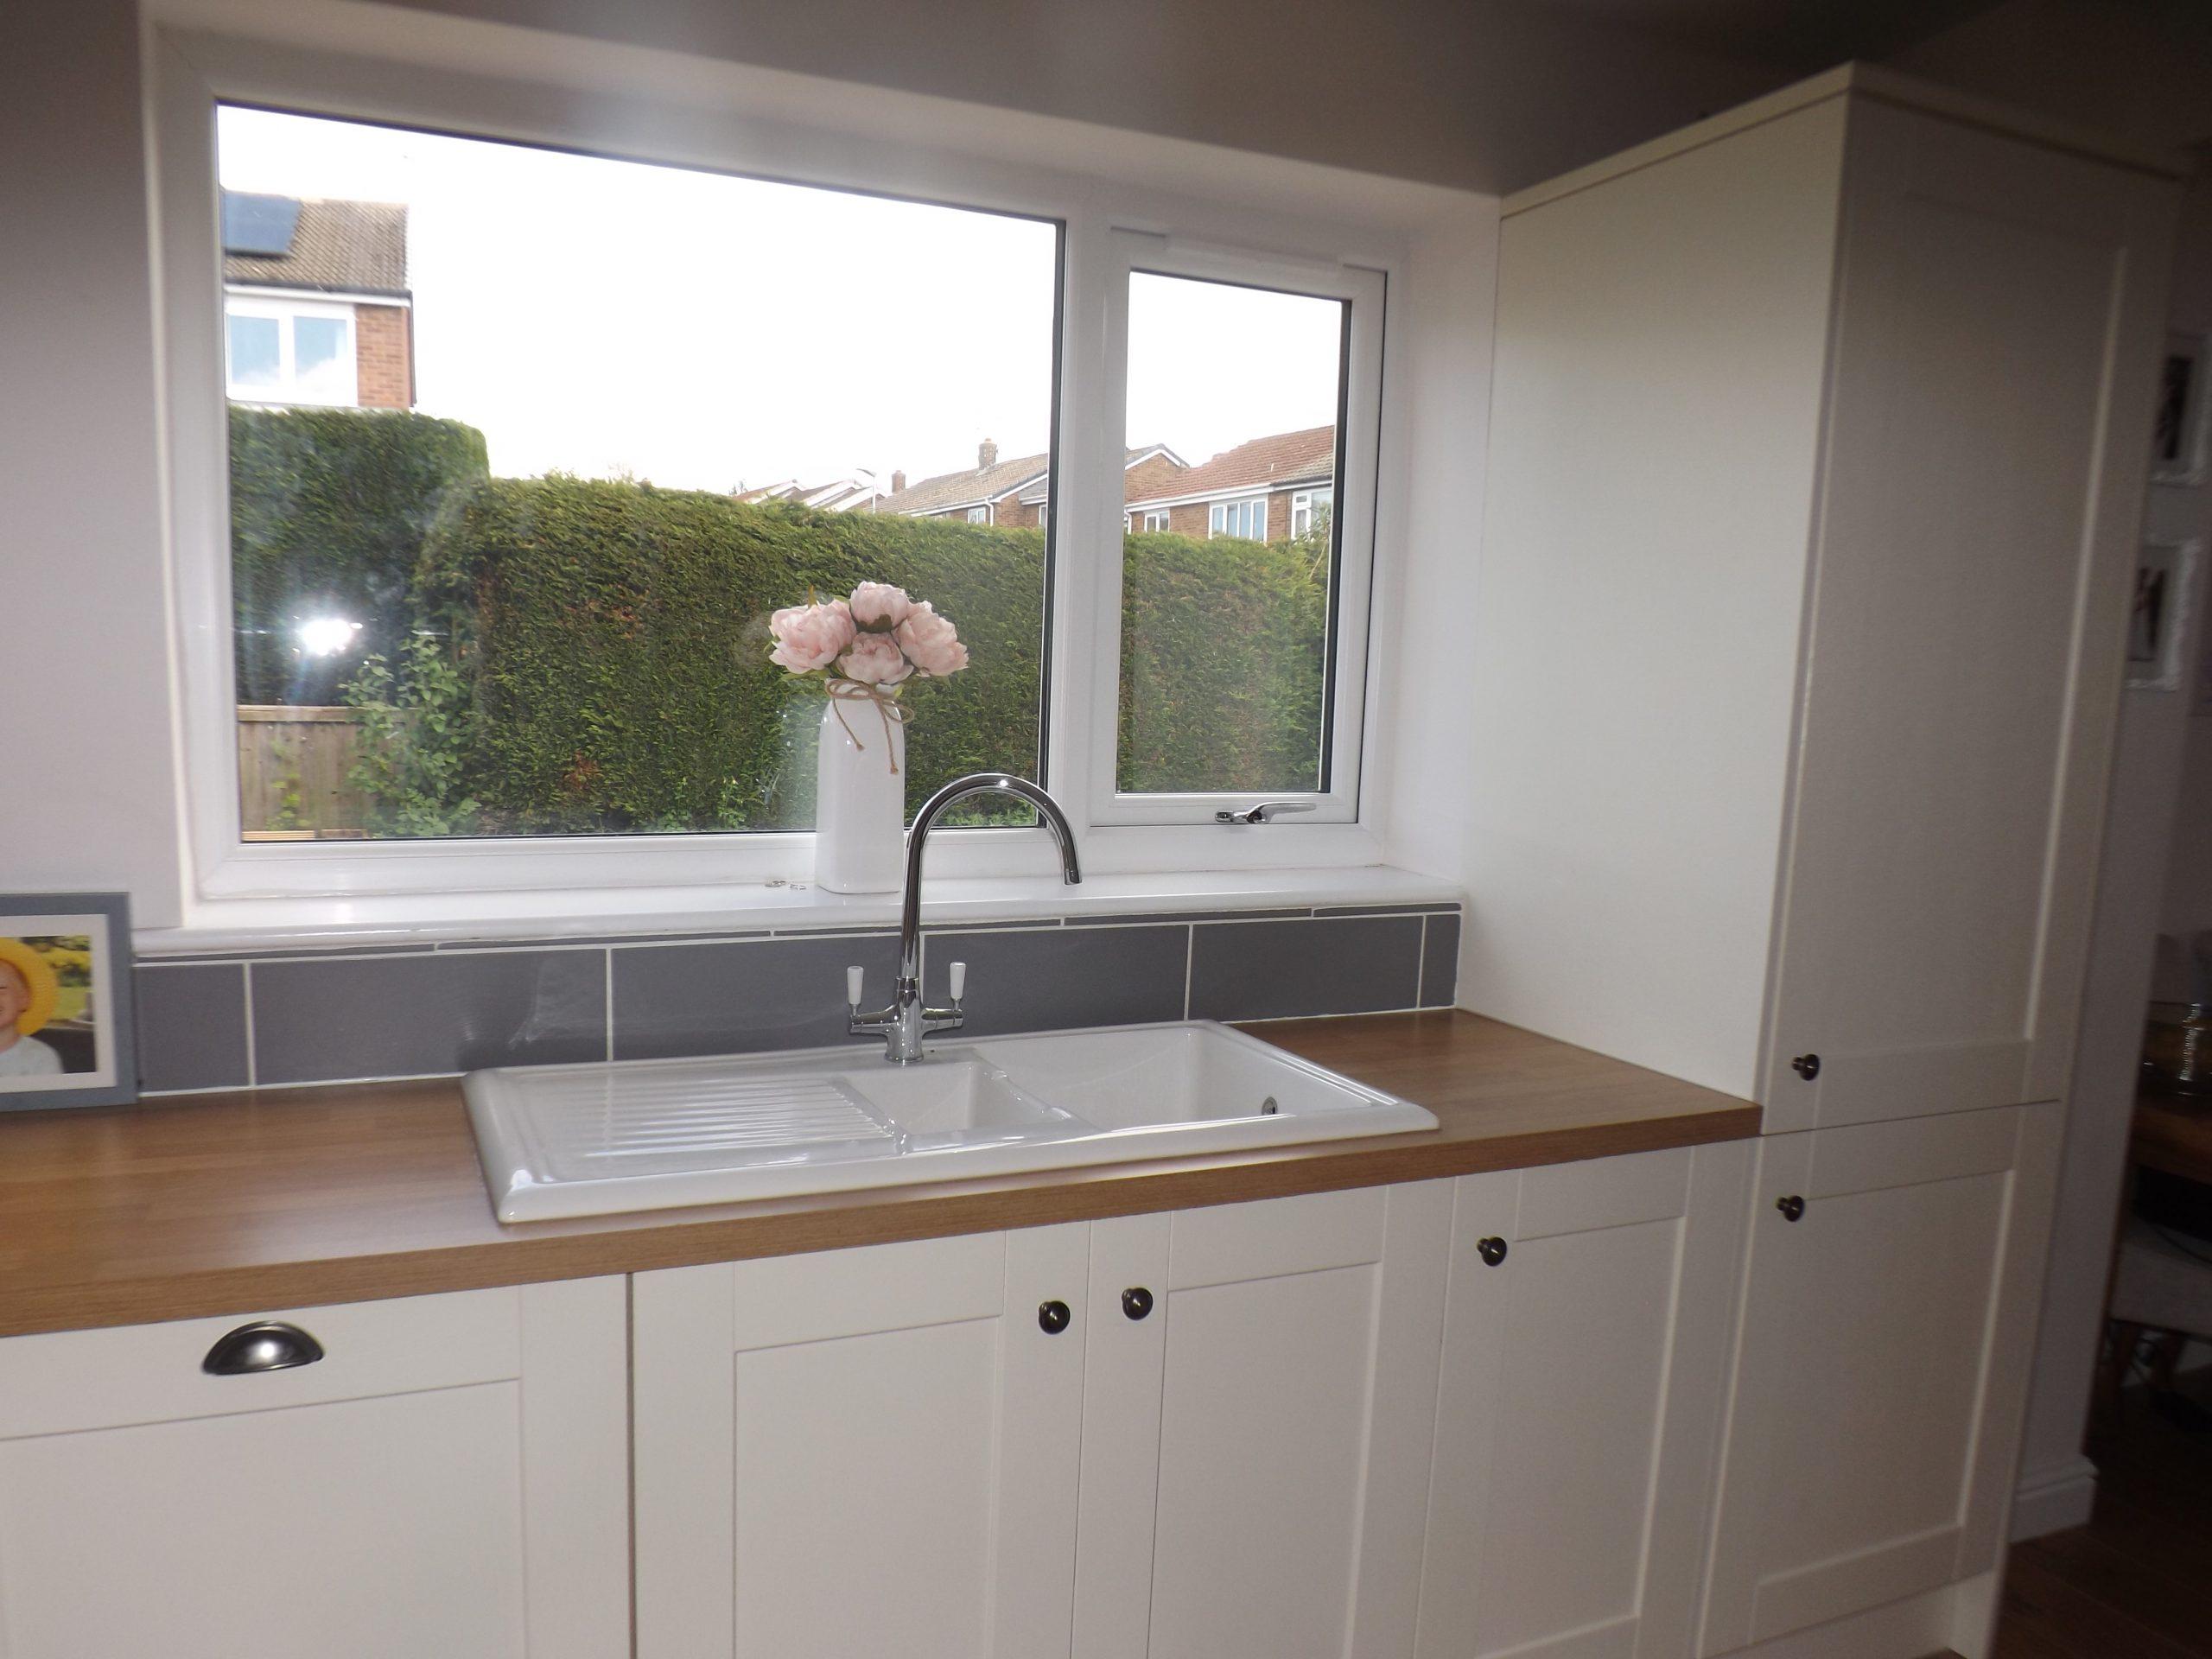 house kitchen Friarside, Witton Gilbert | Durham property